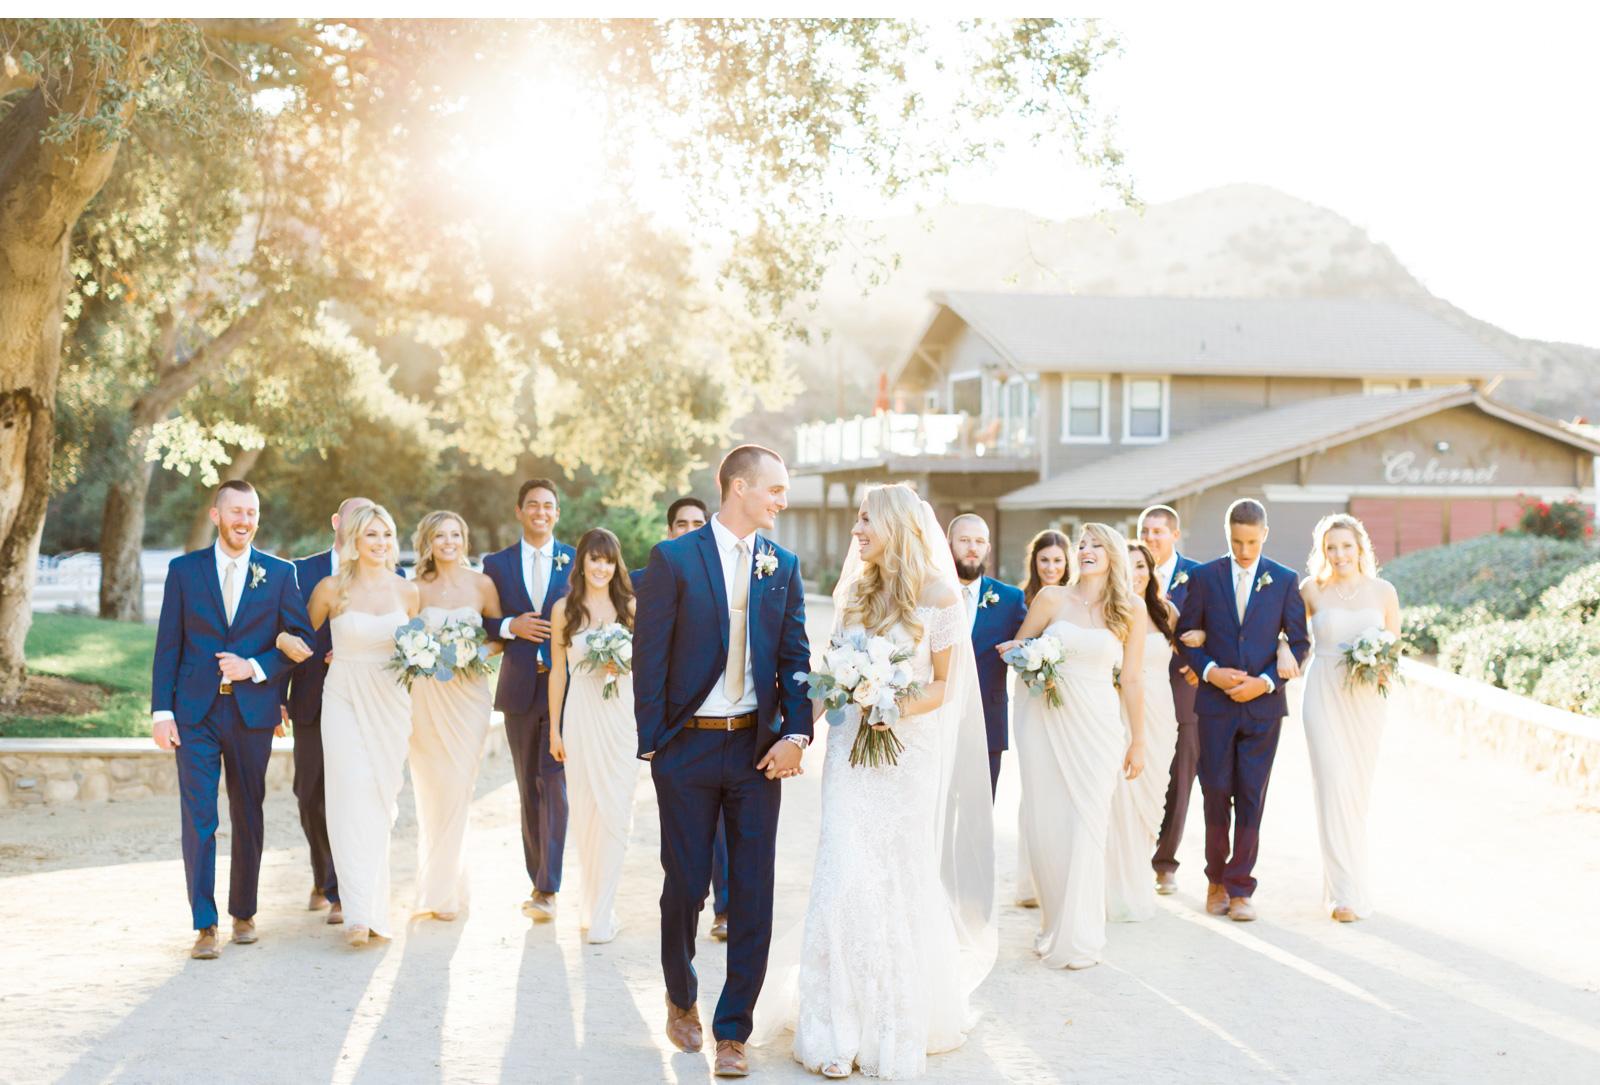 Style-Me-Pretty-Wedding-Photographer-Natalie-Schutt-Photography-Calfornia-San-Luis-Obispo_13.jpg